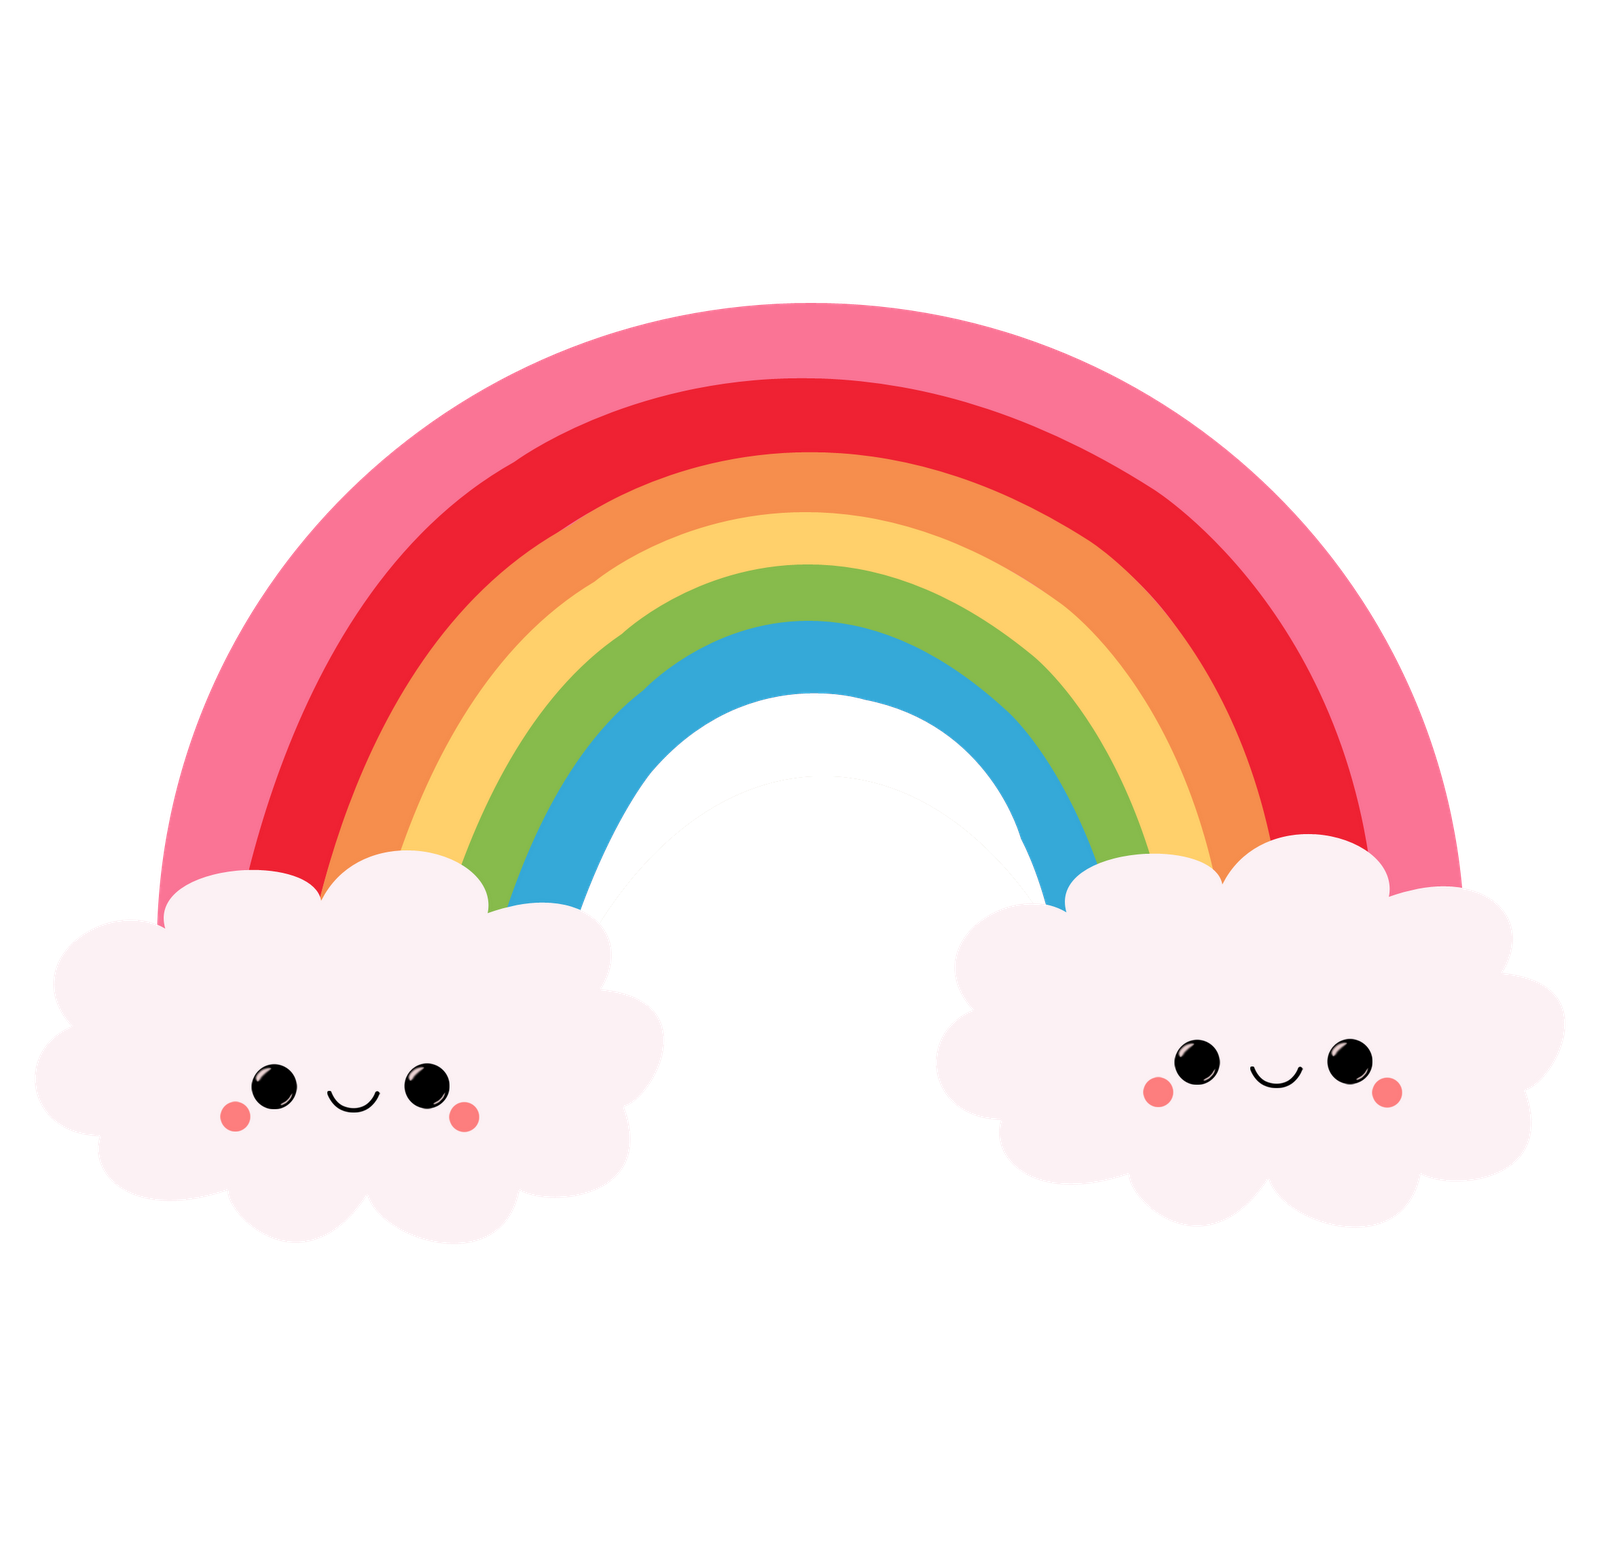 Rainbow cross clipart svg freeuse stock arcoiris png - Buscar con Google | Clipart | Pinterest | Kawaii ... svg freeuse stock